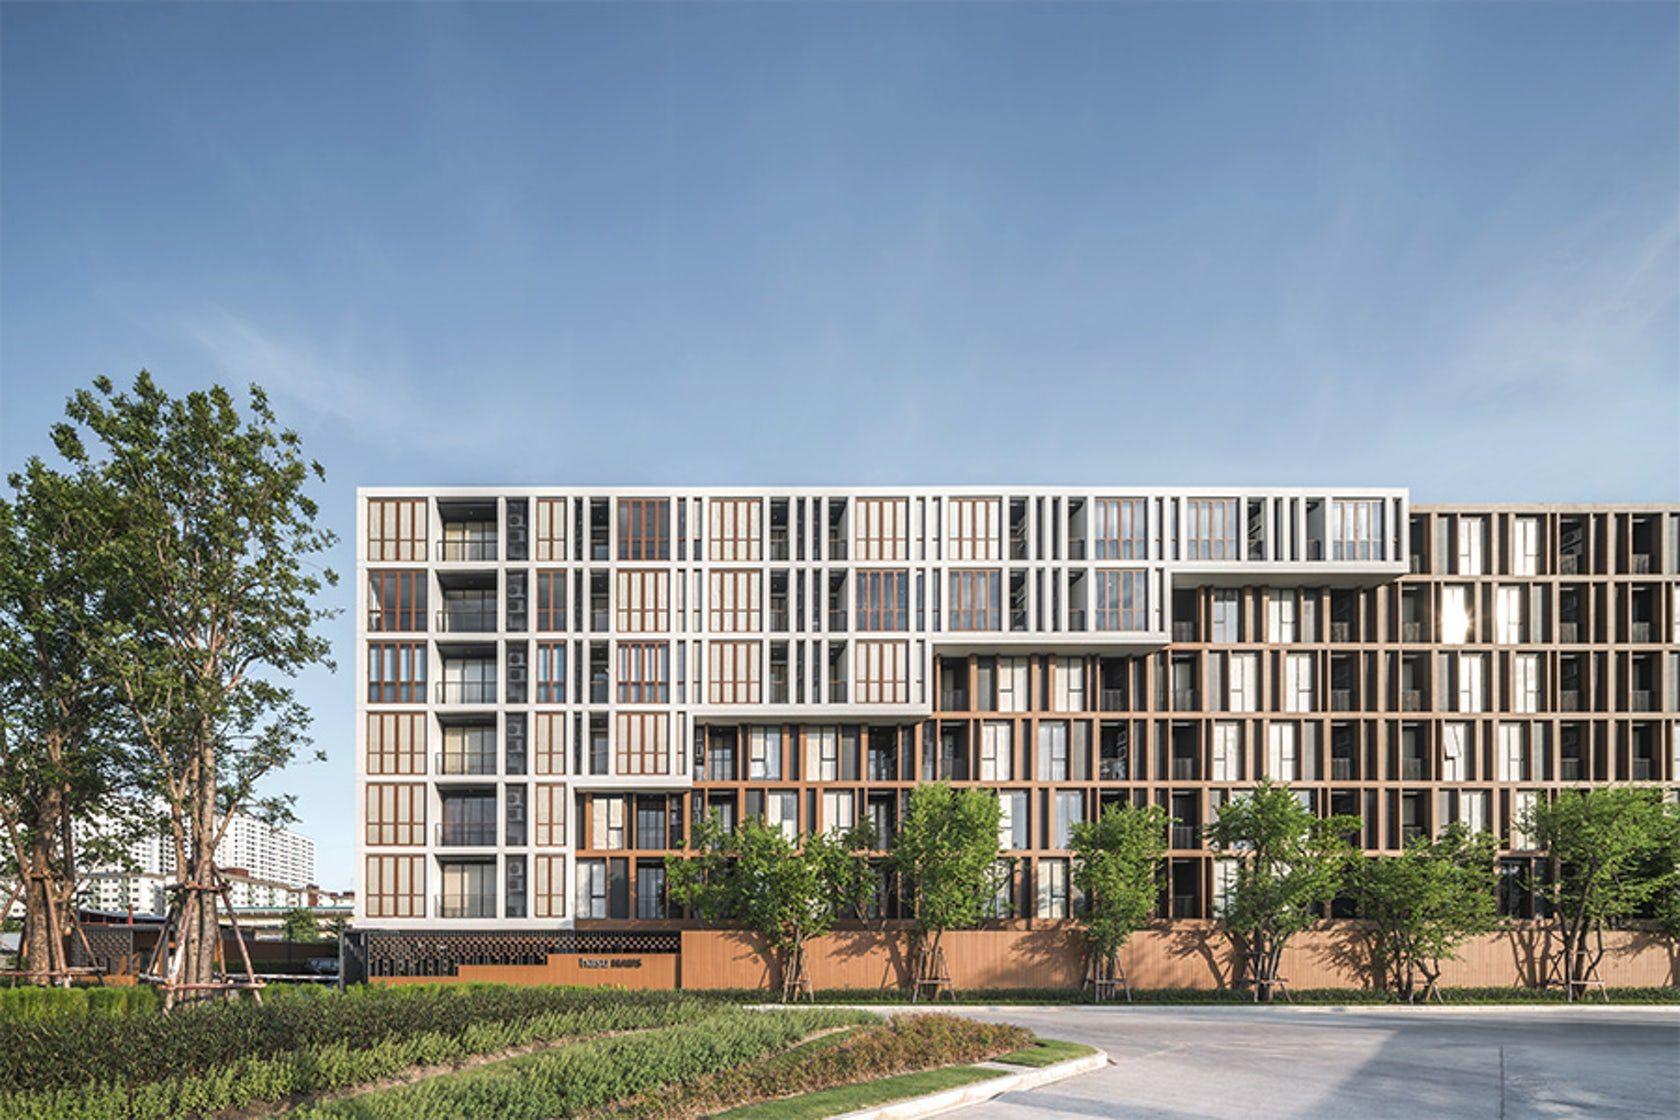 0c17b3d6704 Hasu Haus The design of Hasu Haus was aimed at reinterpreting the old way  of living